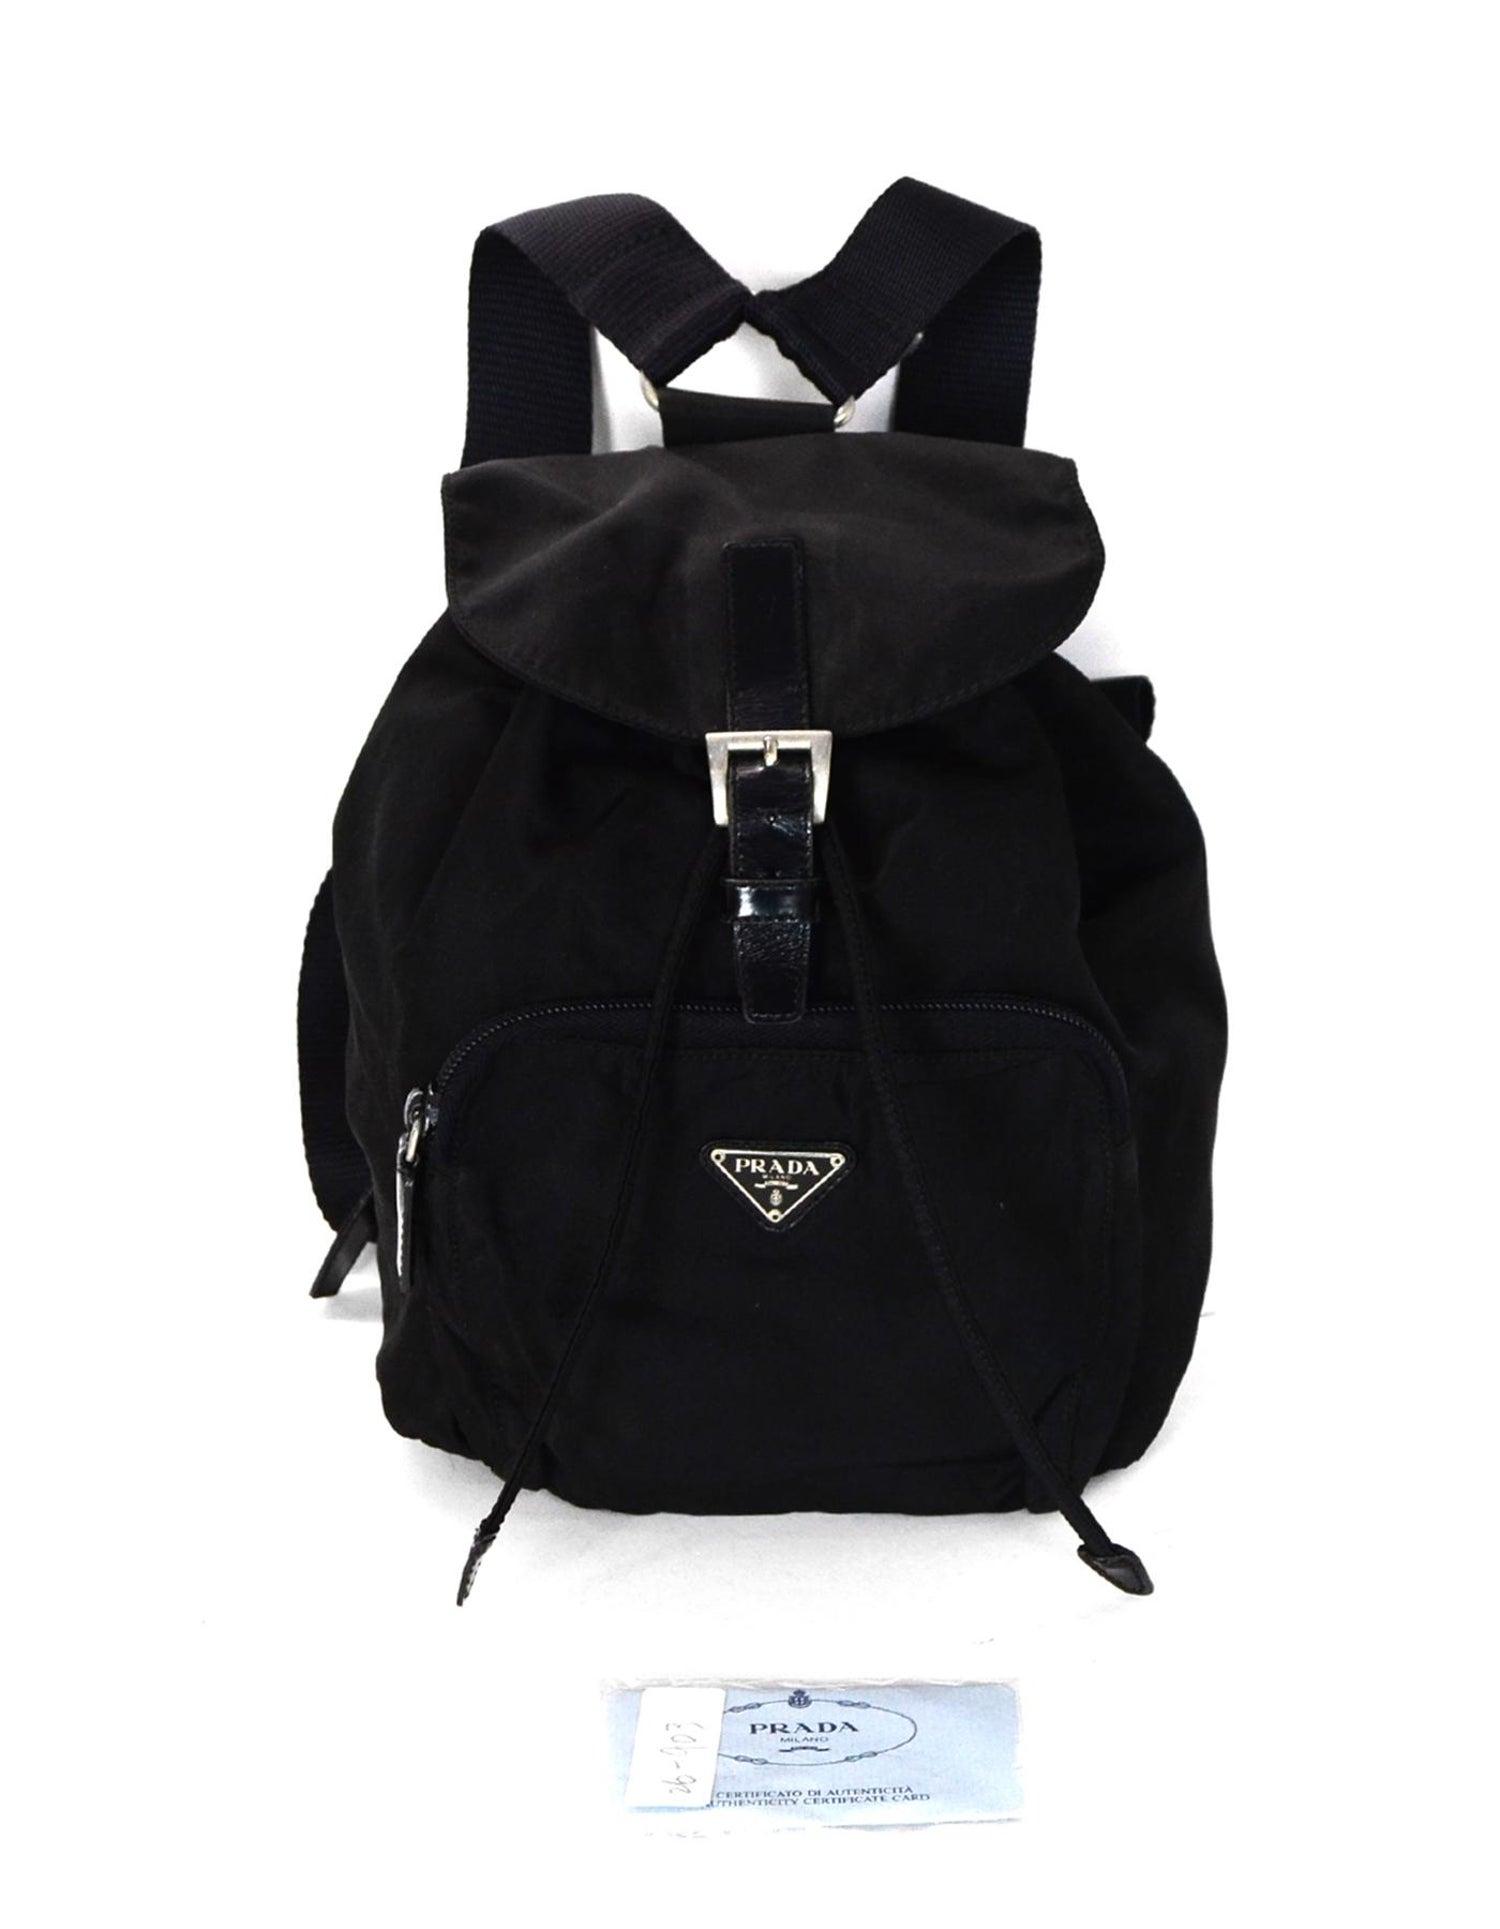 14521fc8c2adbc Prada Black Nylon Small Backpack Bag W/ Front Zip Pocket at 1stdibs